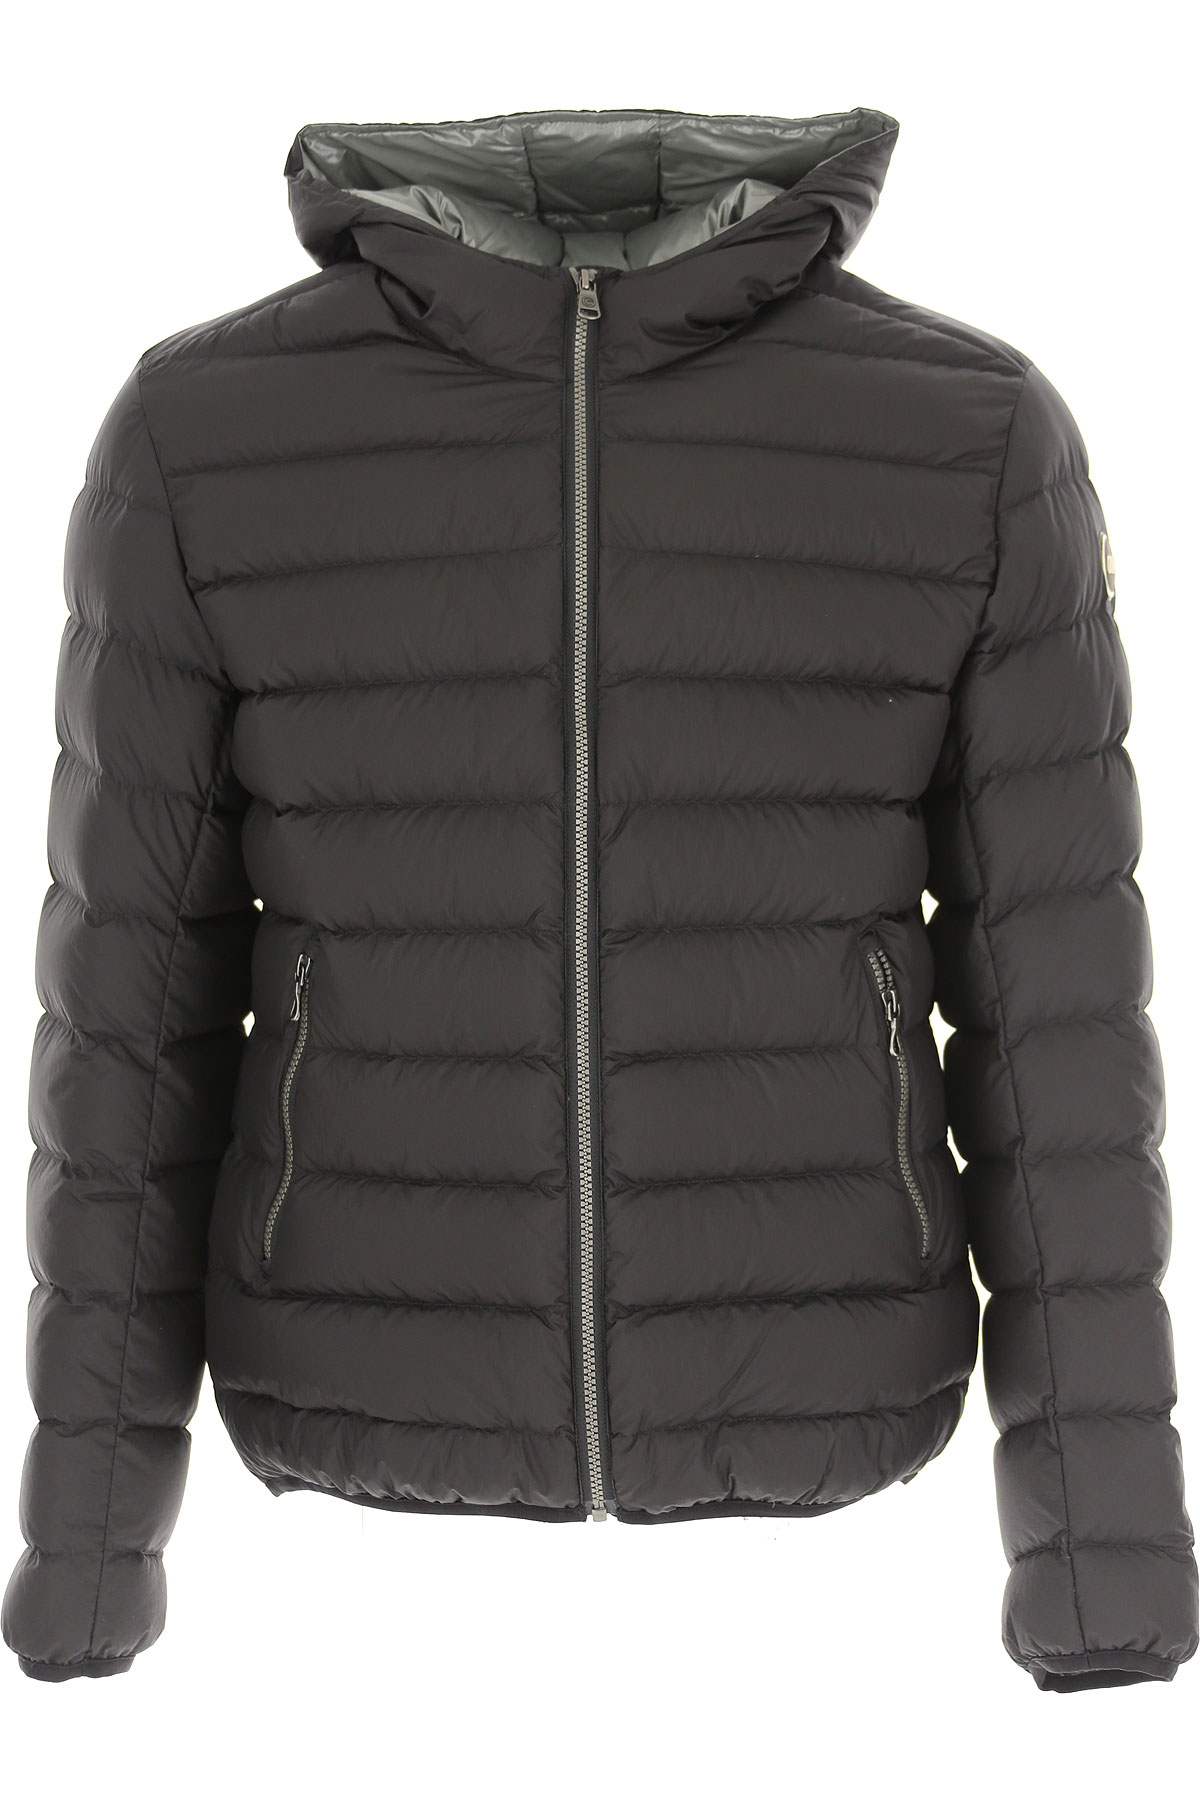 Colmar Down Jacket for Men, Puffer Ski Jacket On Sale, Black, polyamide, 2019, L S XL XXXL